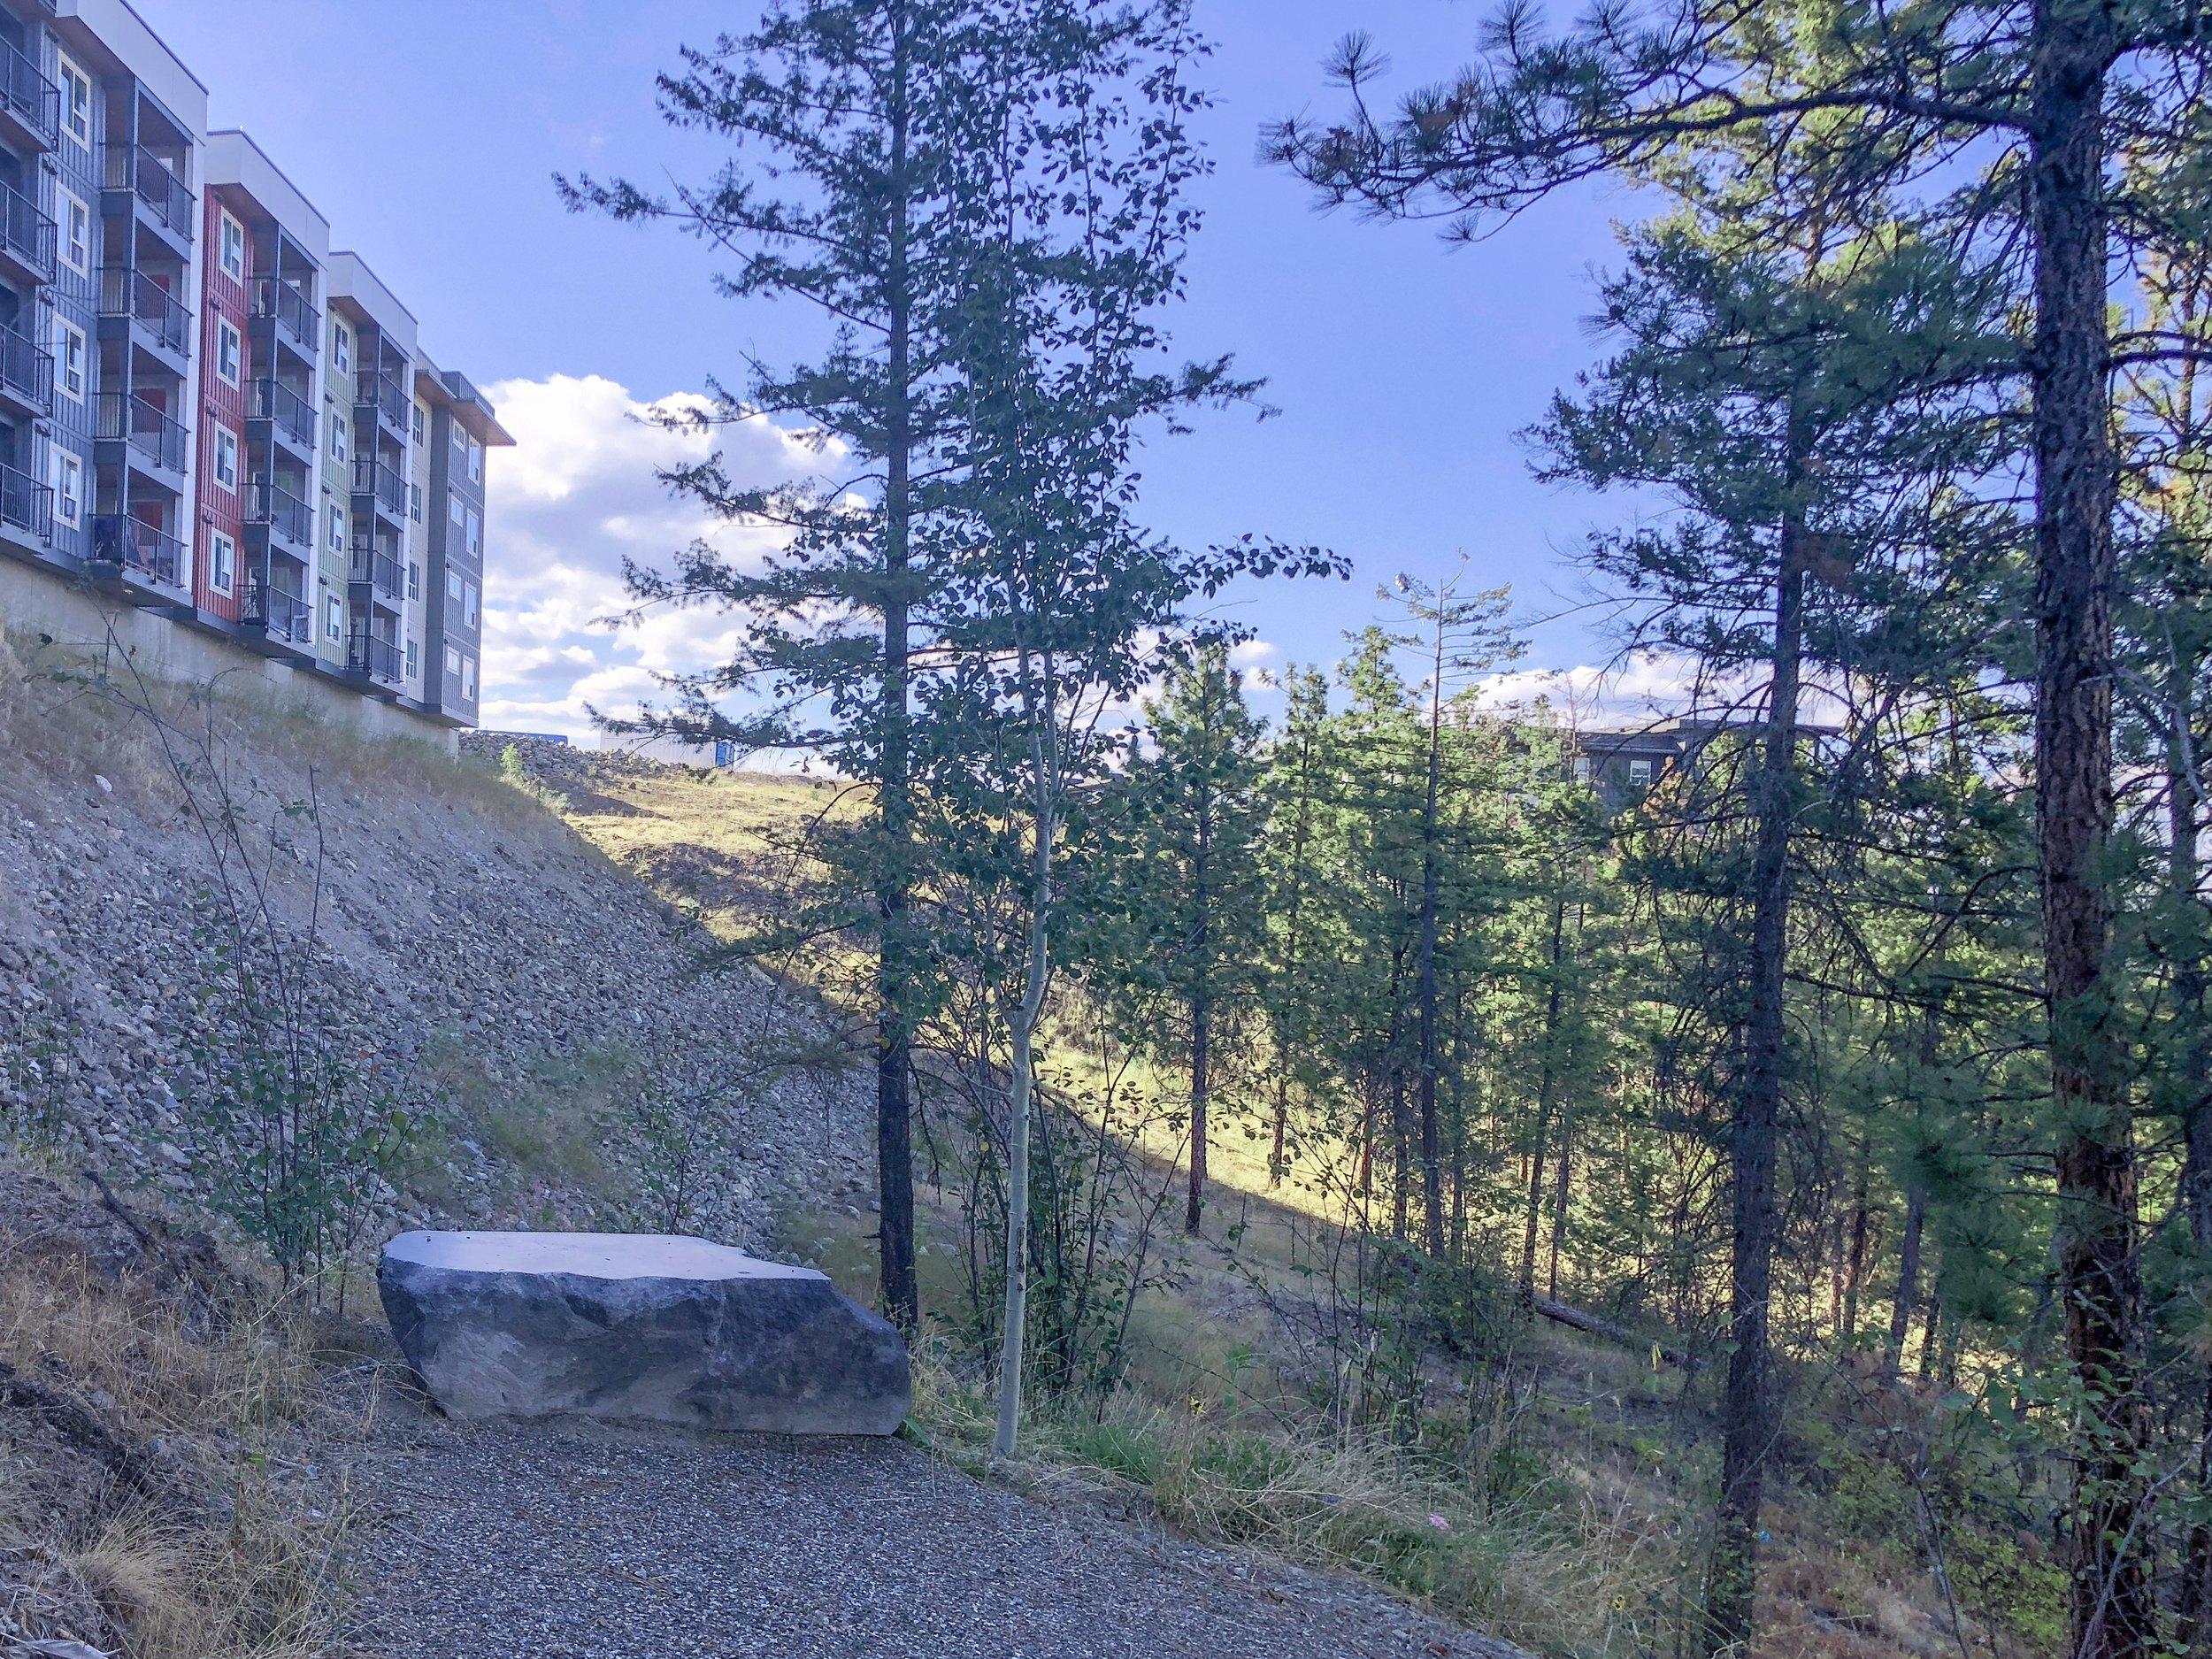 u-three-ubco-kelowna-investment-property-outdoor-bench.jpg